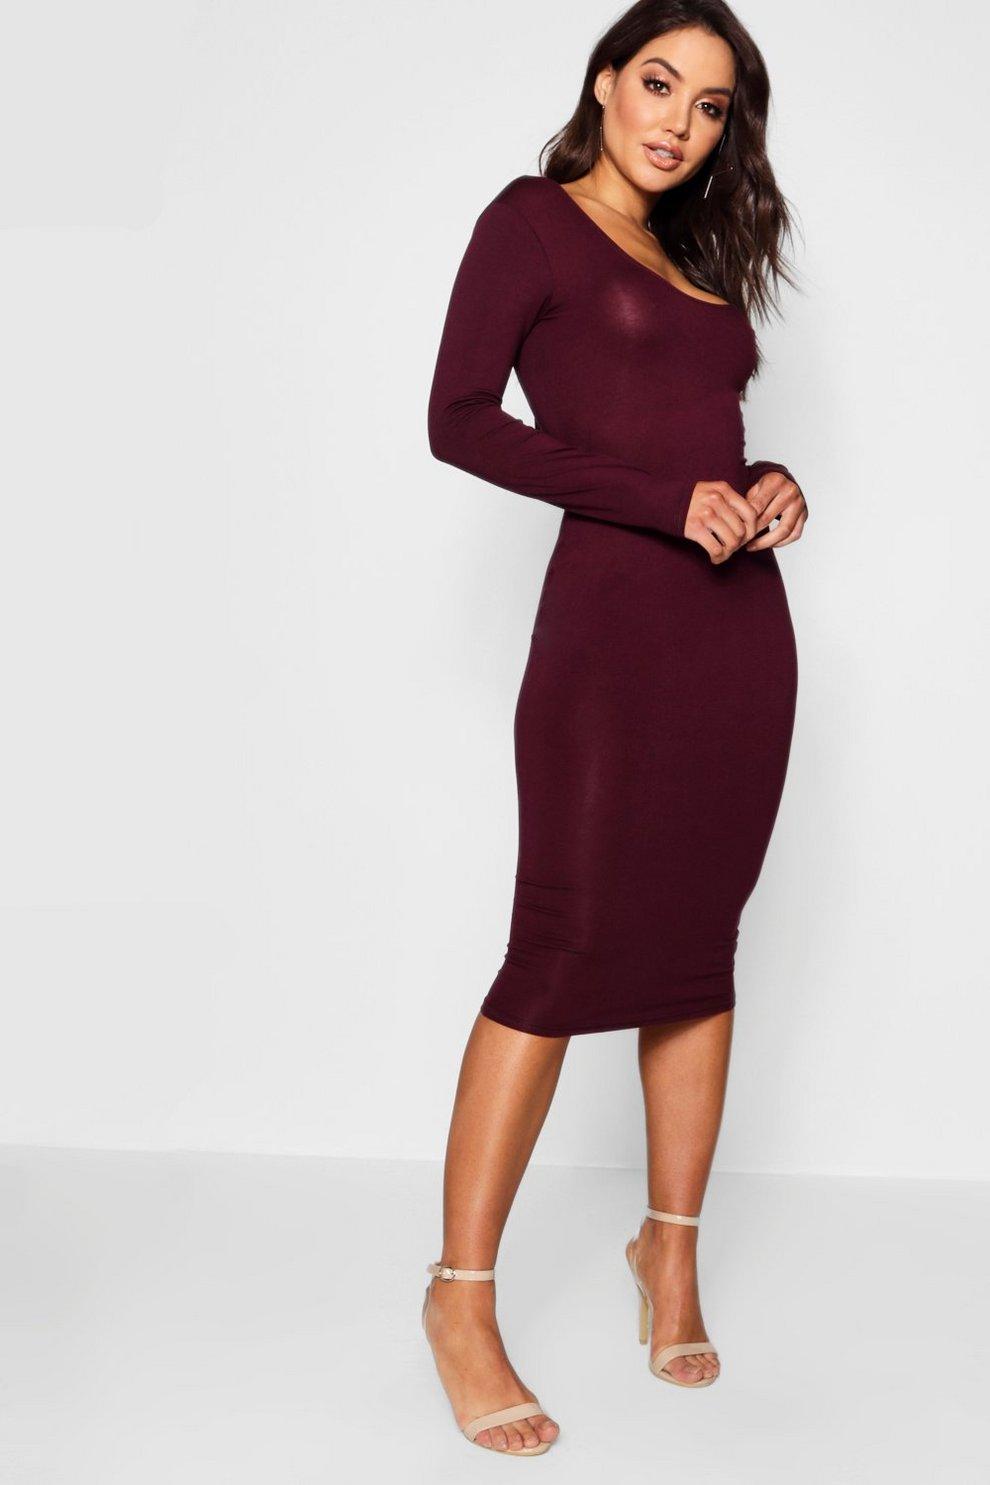 2a0698f5a4b3 Womens Black plum Square Neck Long Sleeved Bodycon Dress